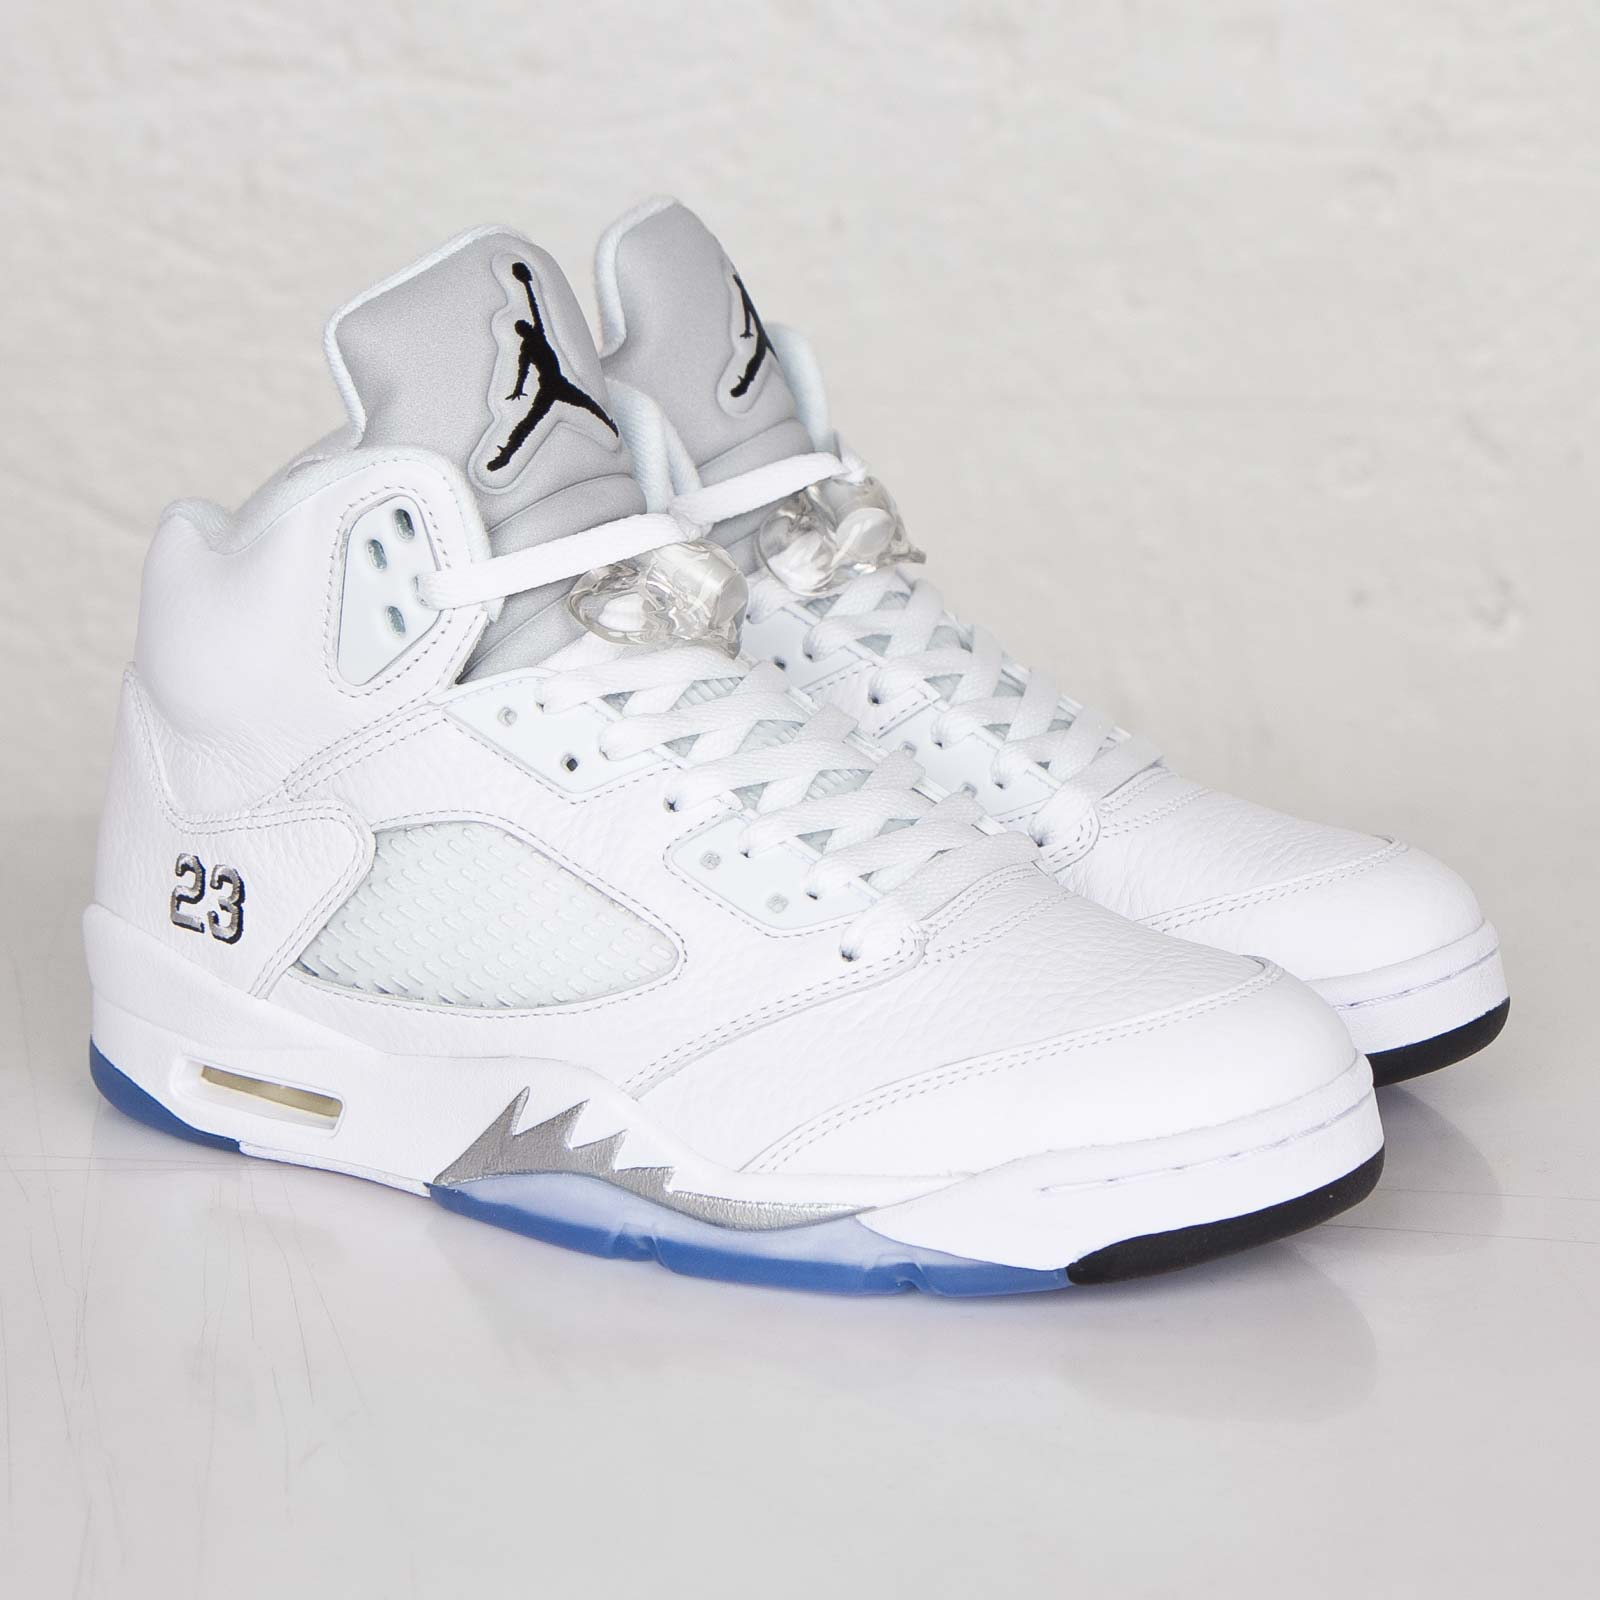 check out fa10b c3dab Jordan Brand Air Jordan 5 Retro